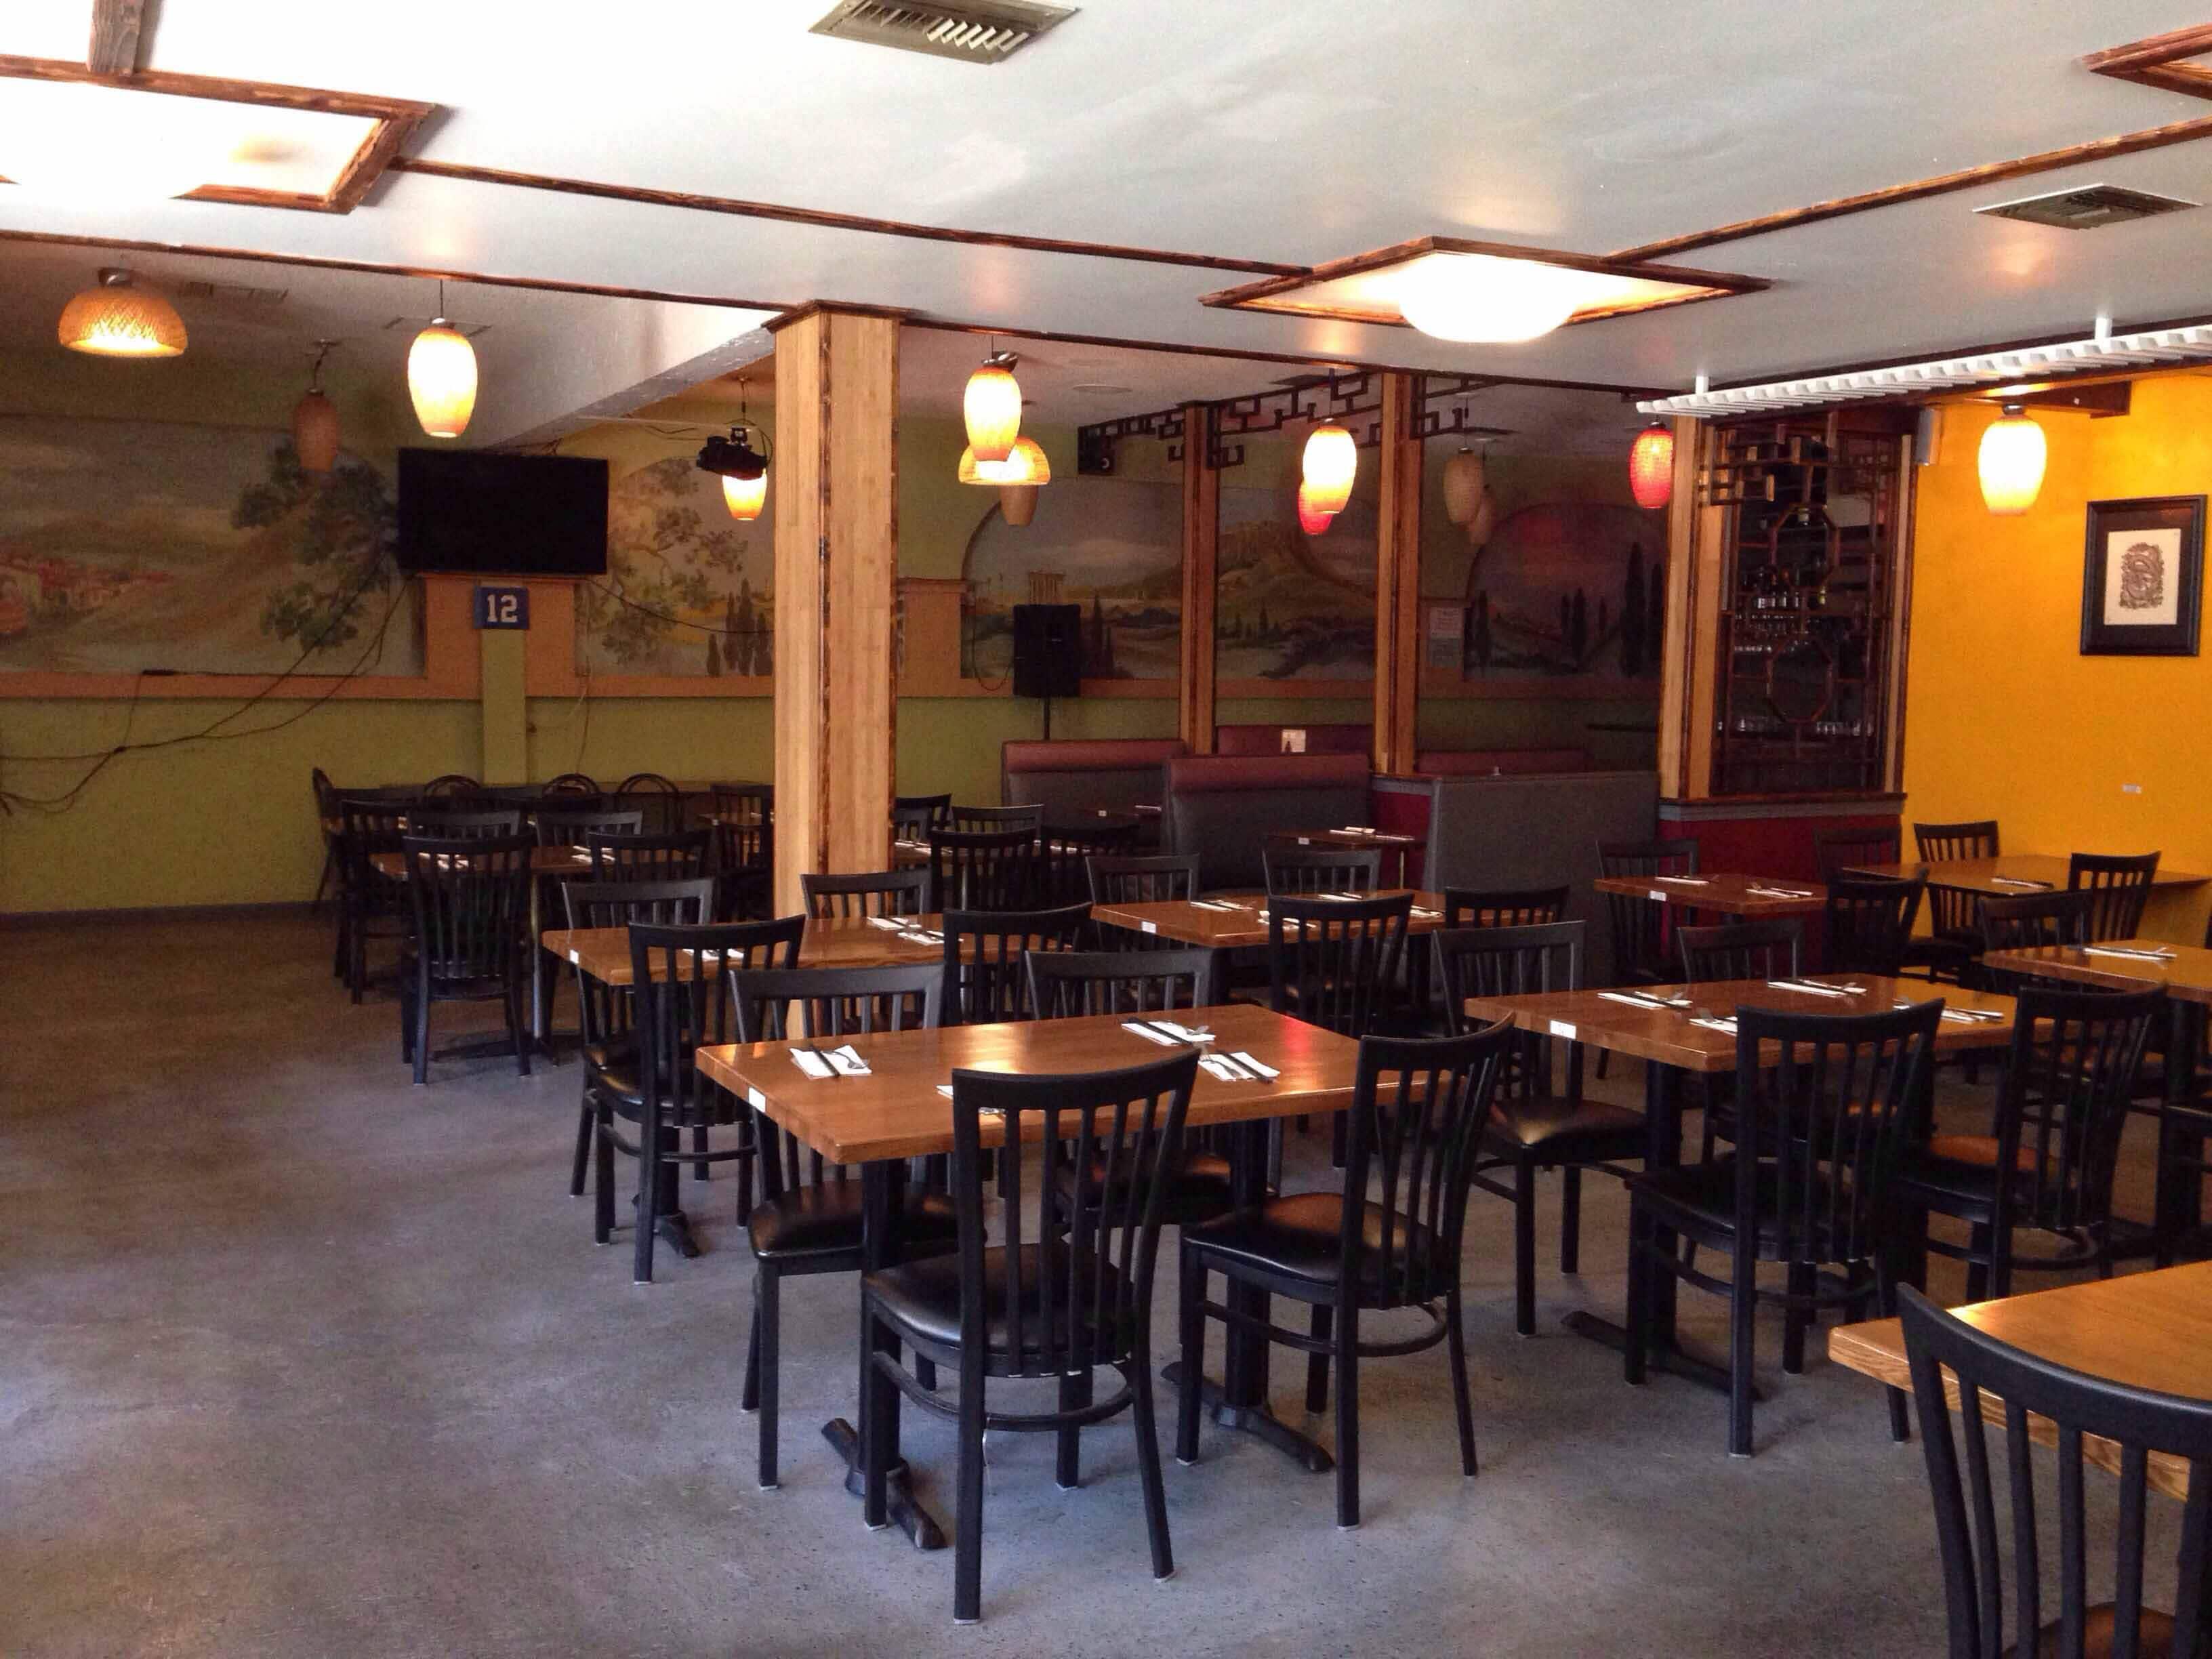 Merveilleux Lotus Asian Kitchen And Lounge, Capitol Hill Photos